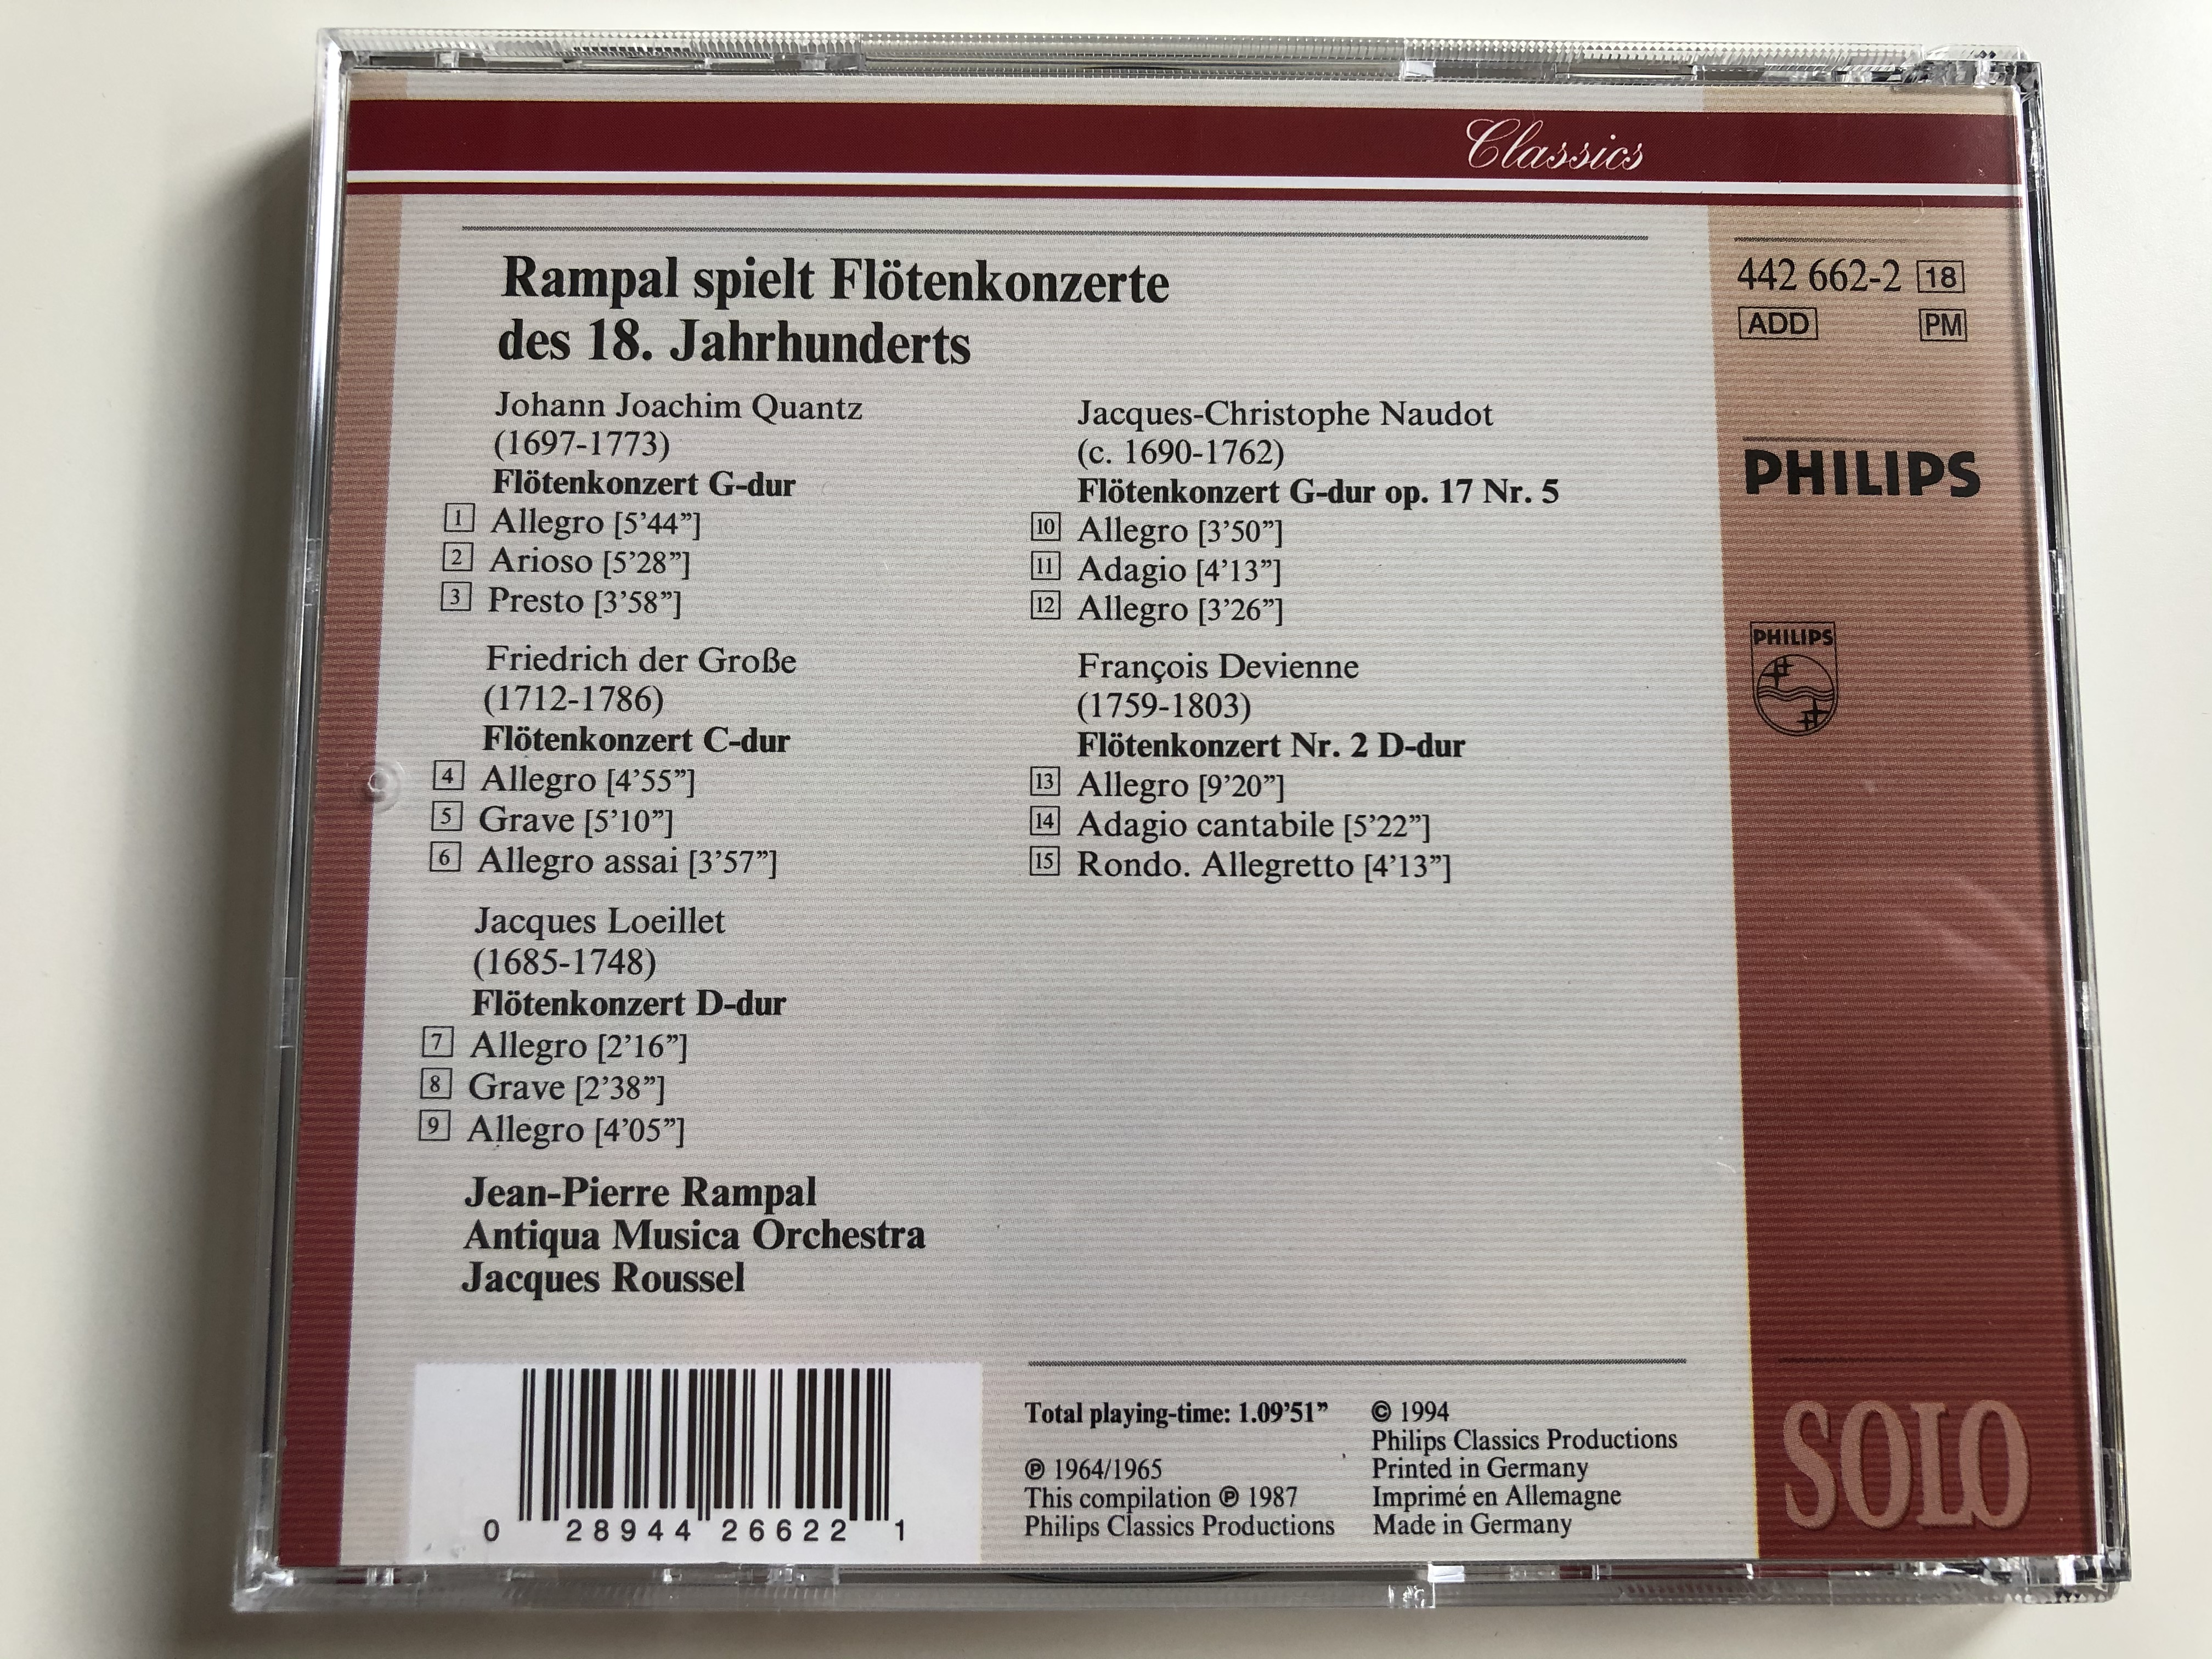 devienne-friedrich-der-grose-loeillet-naudot-quantz-rampal-spielt-flotenkonzerte-des-18.-jahrhunderts-antiqua-musica-orchestra-jacques-roussel-solo-65-min-philips-audio-cd-1994-442-6-7-.jpg